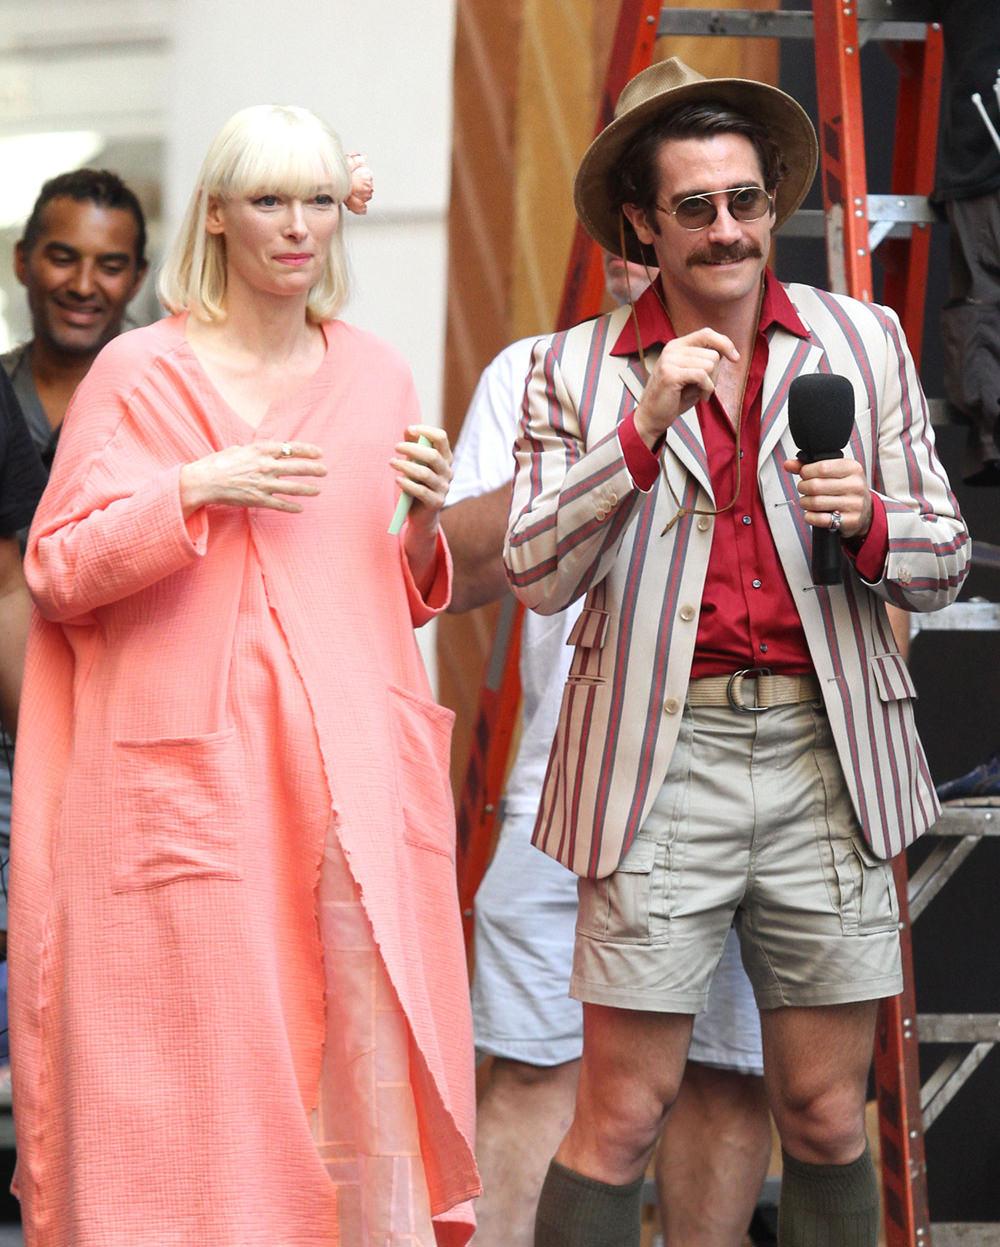 okja_Tilda-Swinton-Jake-Gyllenhaal-Movie-Set-Netflix-Okja-Tom-Lorenzo-Site-1